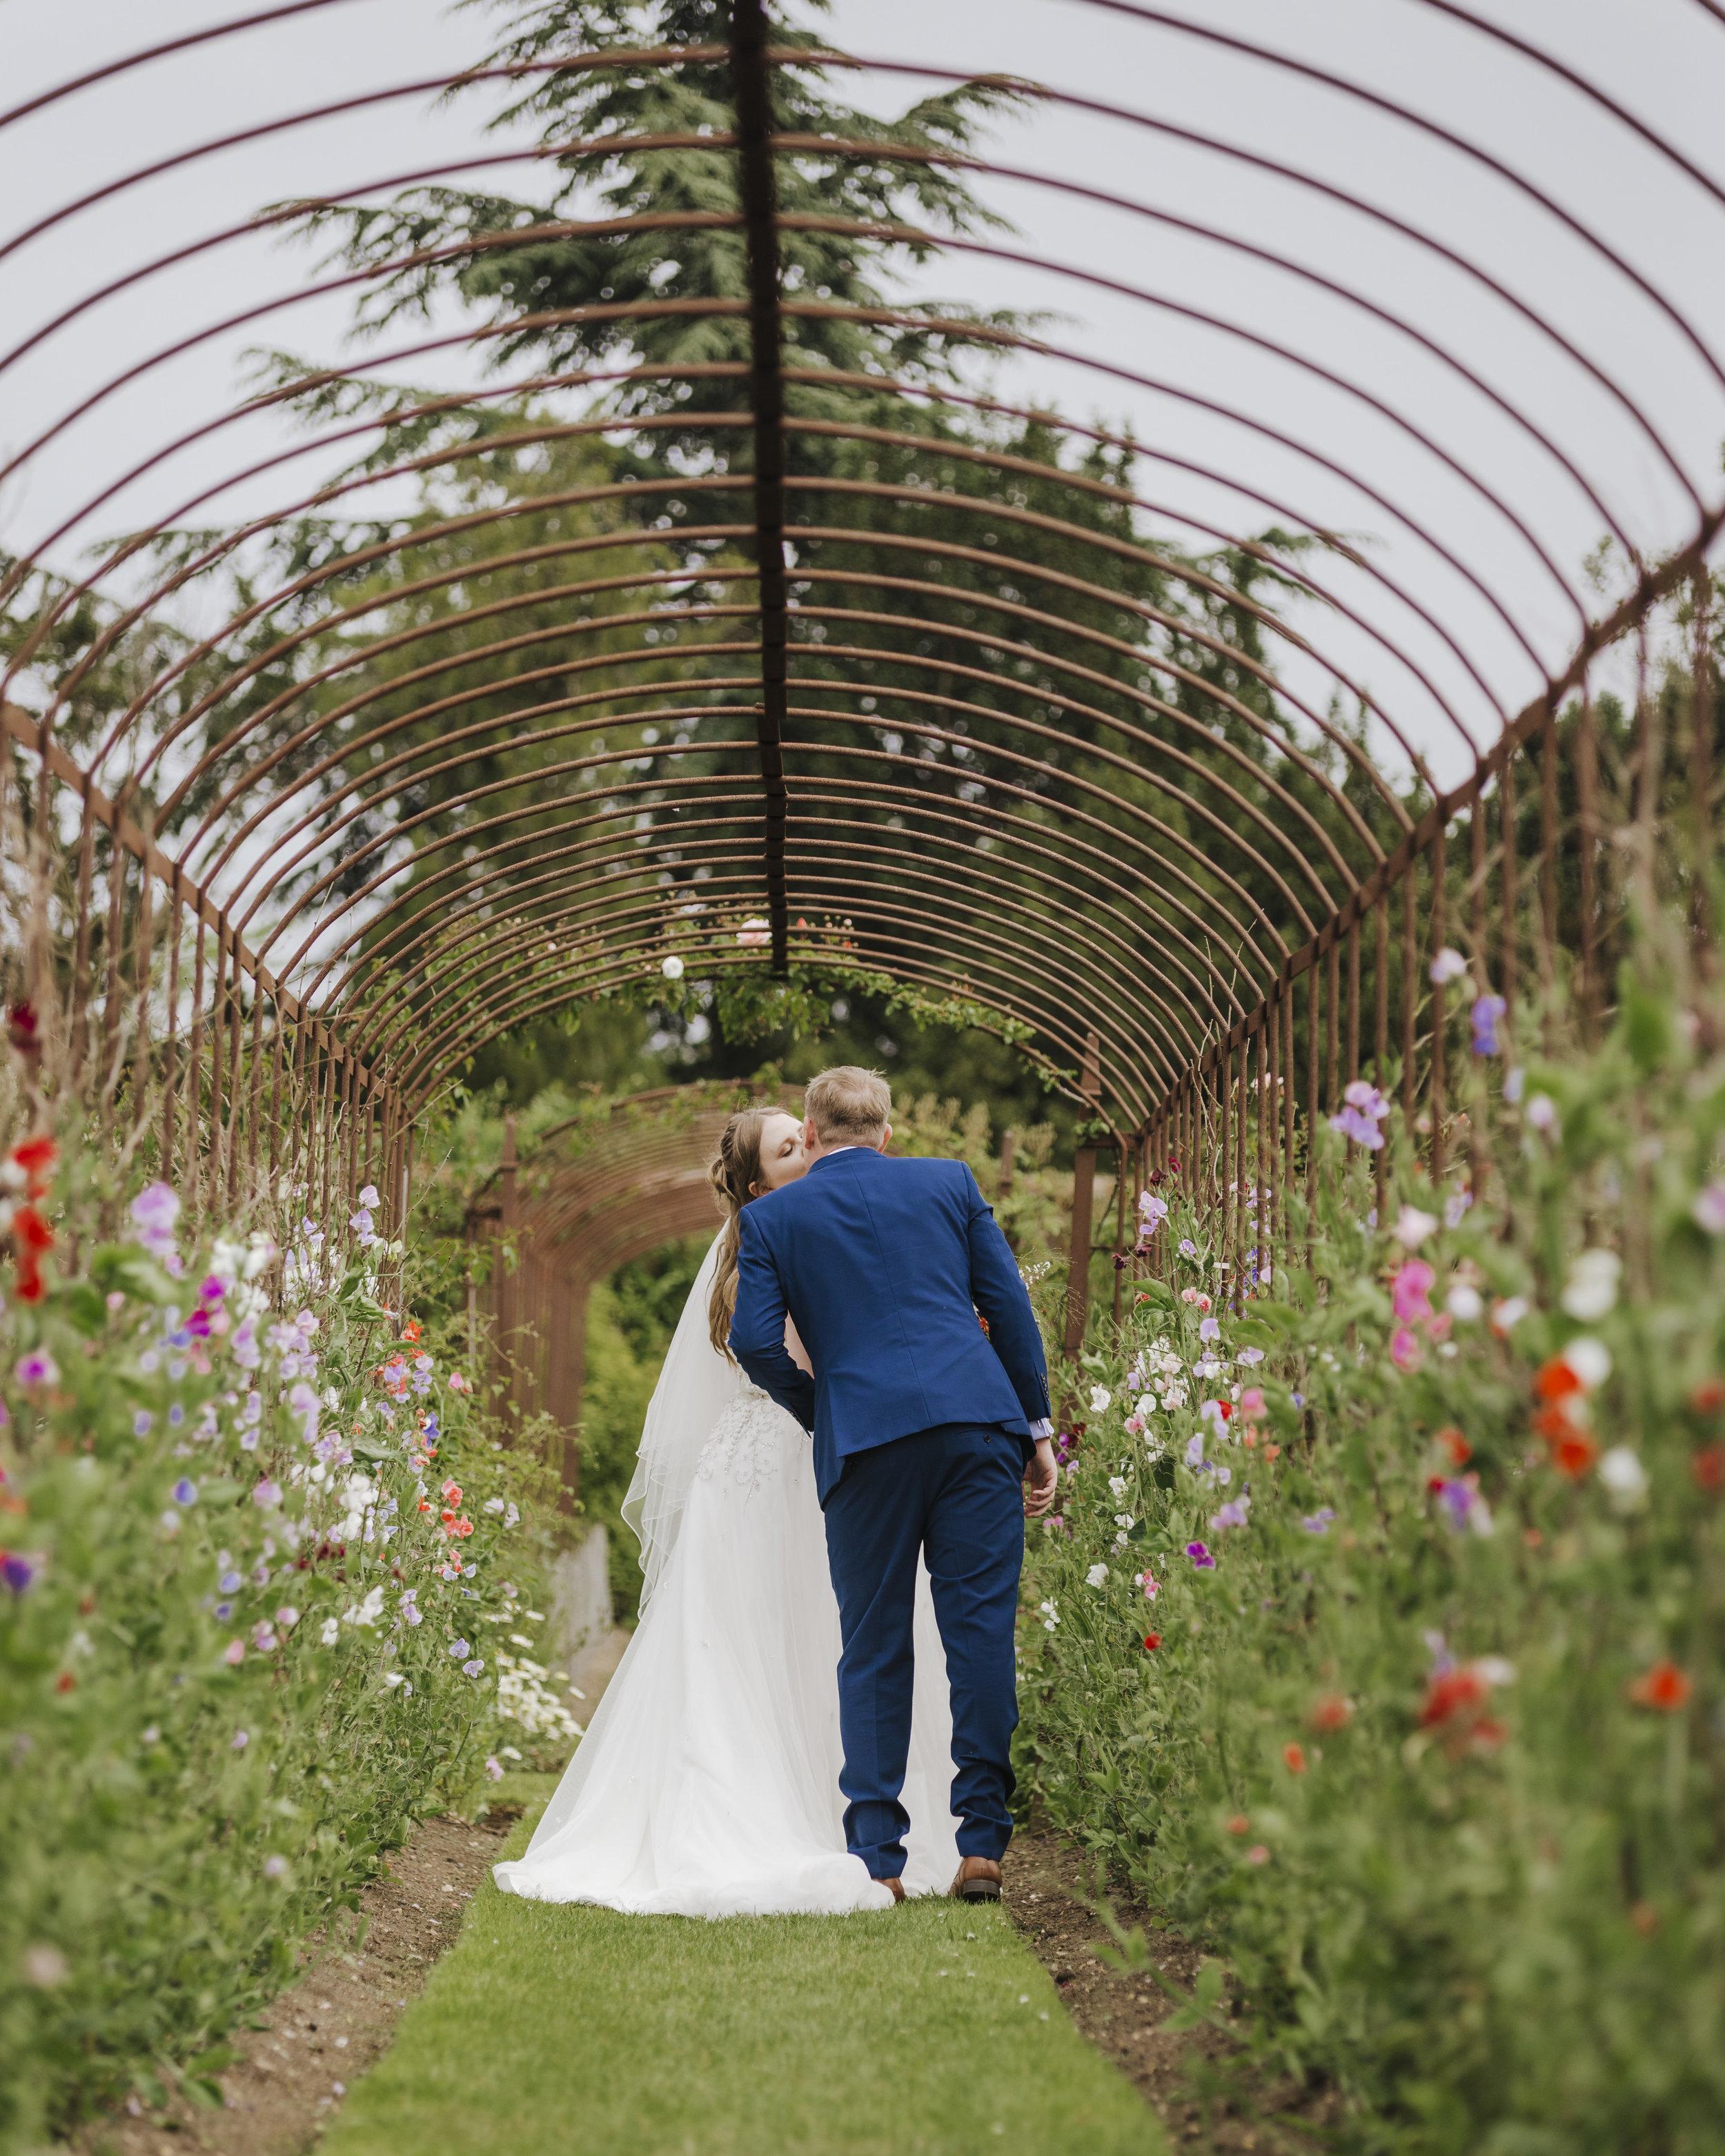 Konjo-Photography-Essex-Suffolk-Norfolk-Wedding-Photographer-And-Videographer-Wedding-Videography (5).JPG